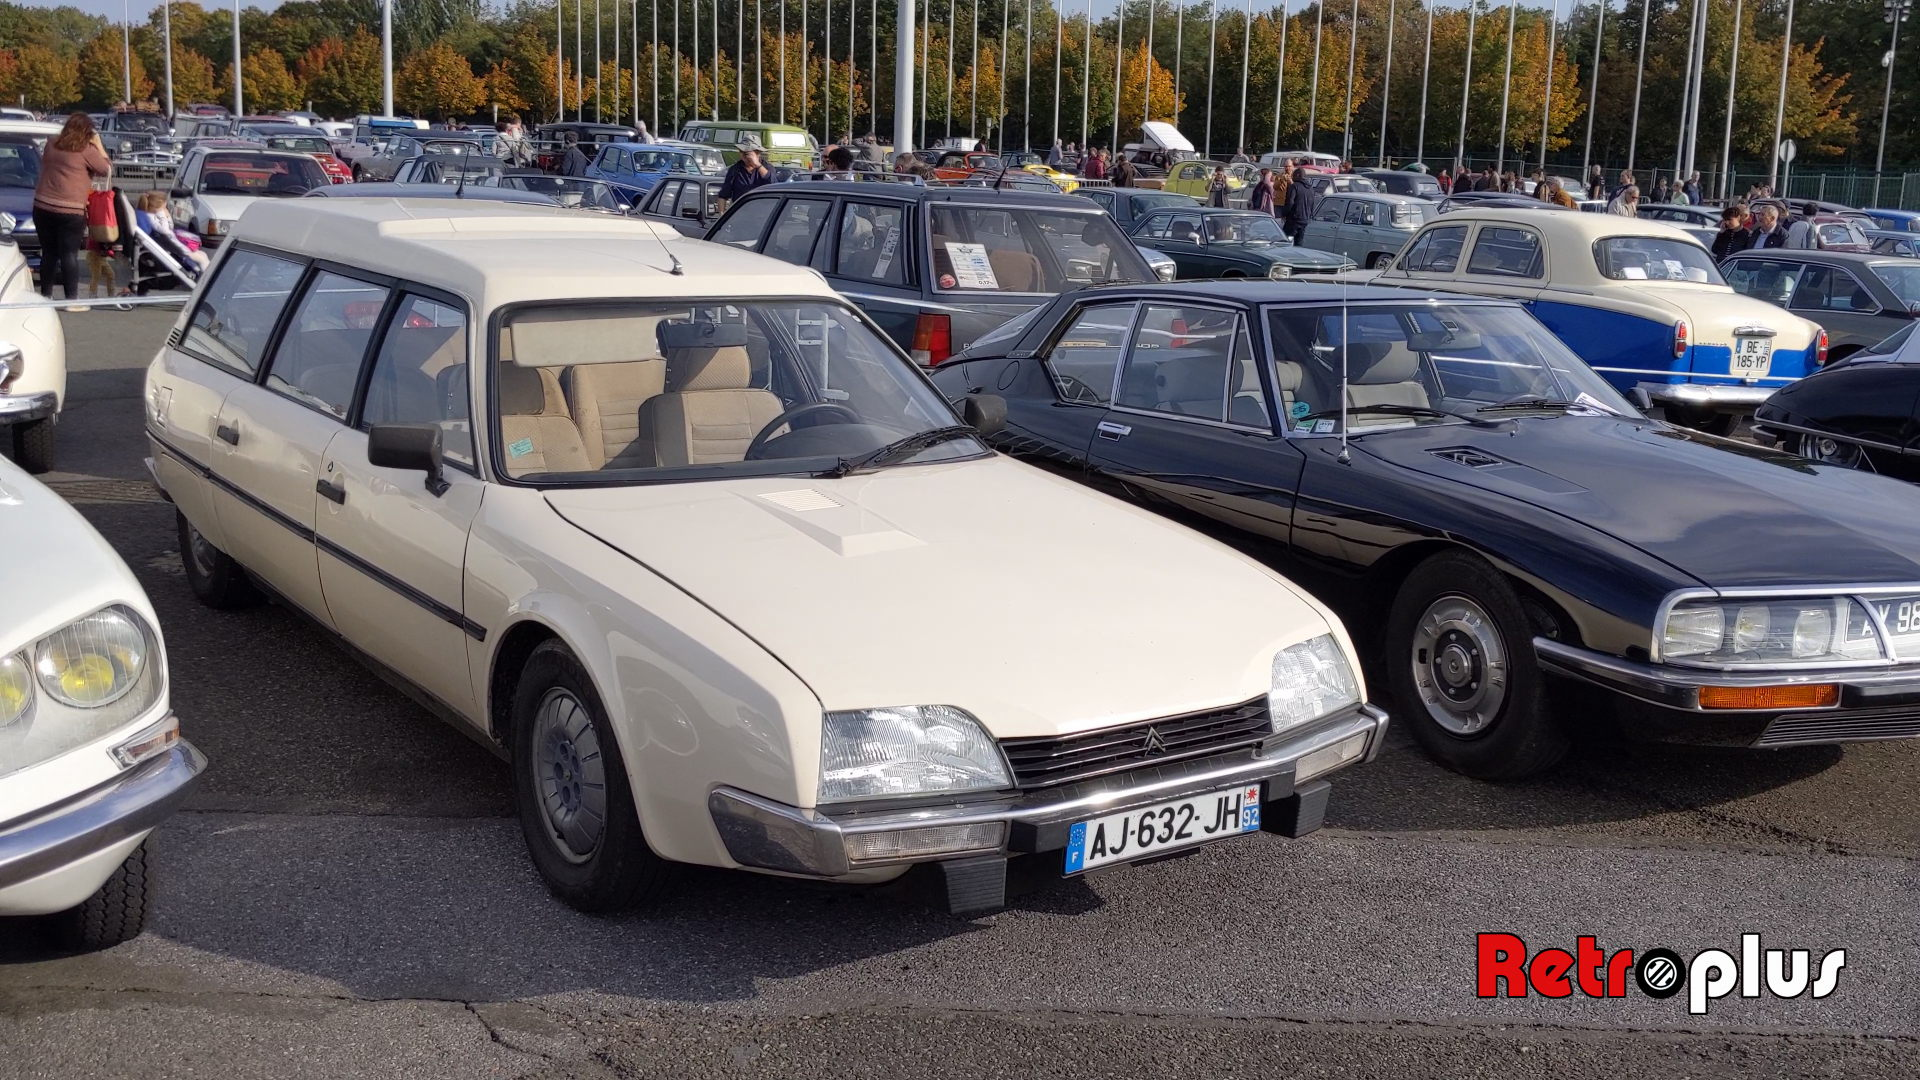 Automedon2019-parkingCitroen41